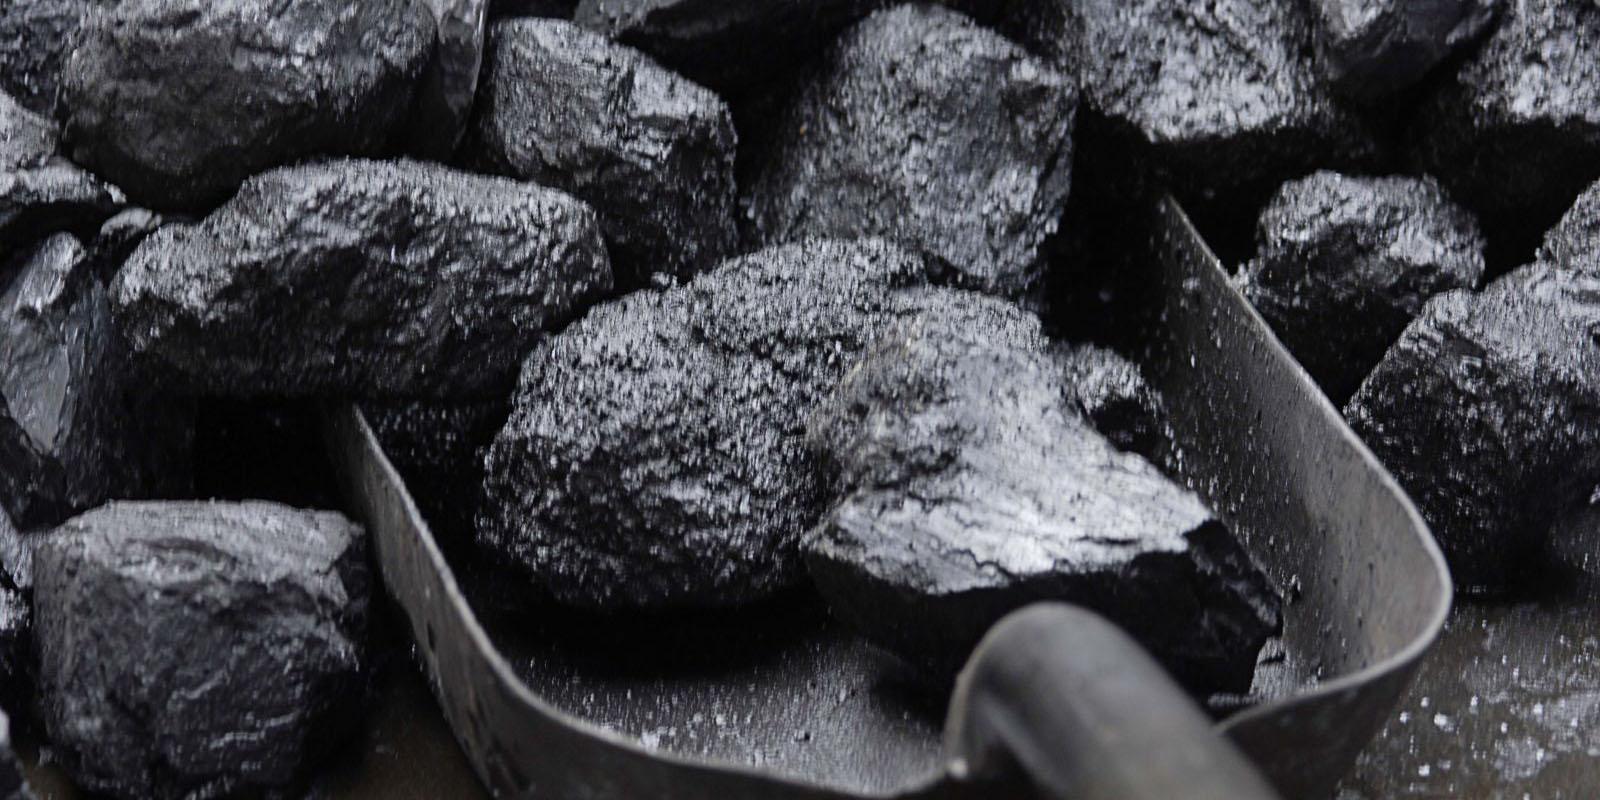 زغال سنگ نیازمند مدیریت یکپارچه